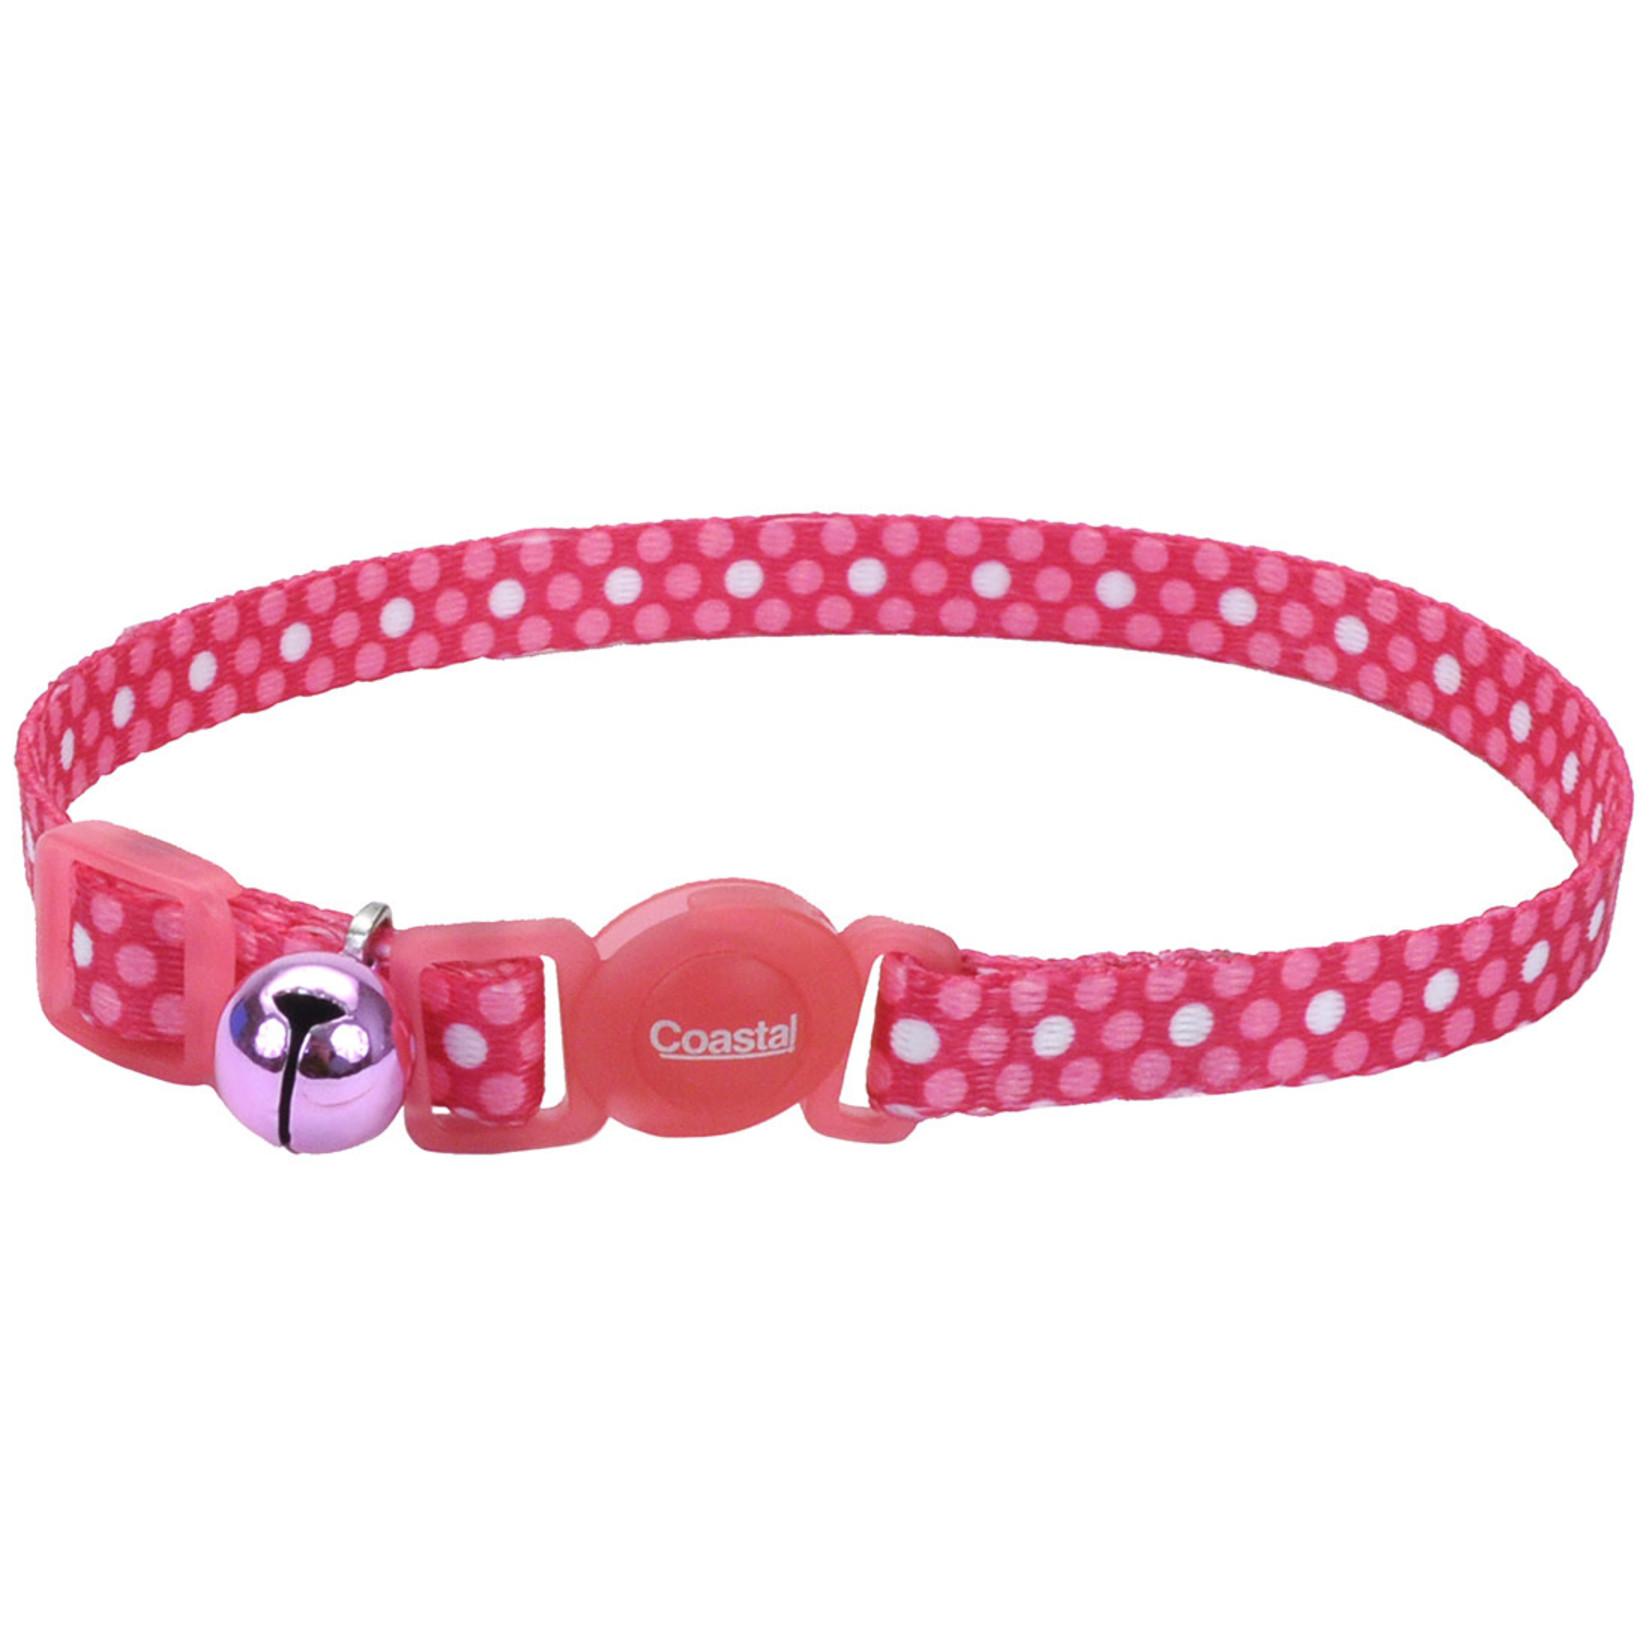 "Coastal Pet Products COAST Safe Cat Fashion Collar 8-12"""